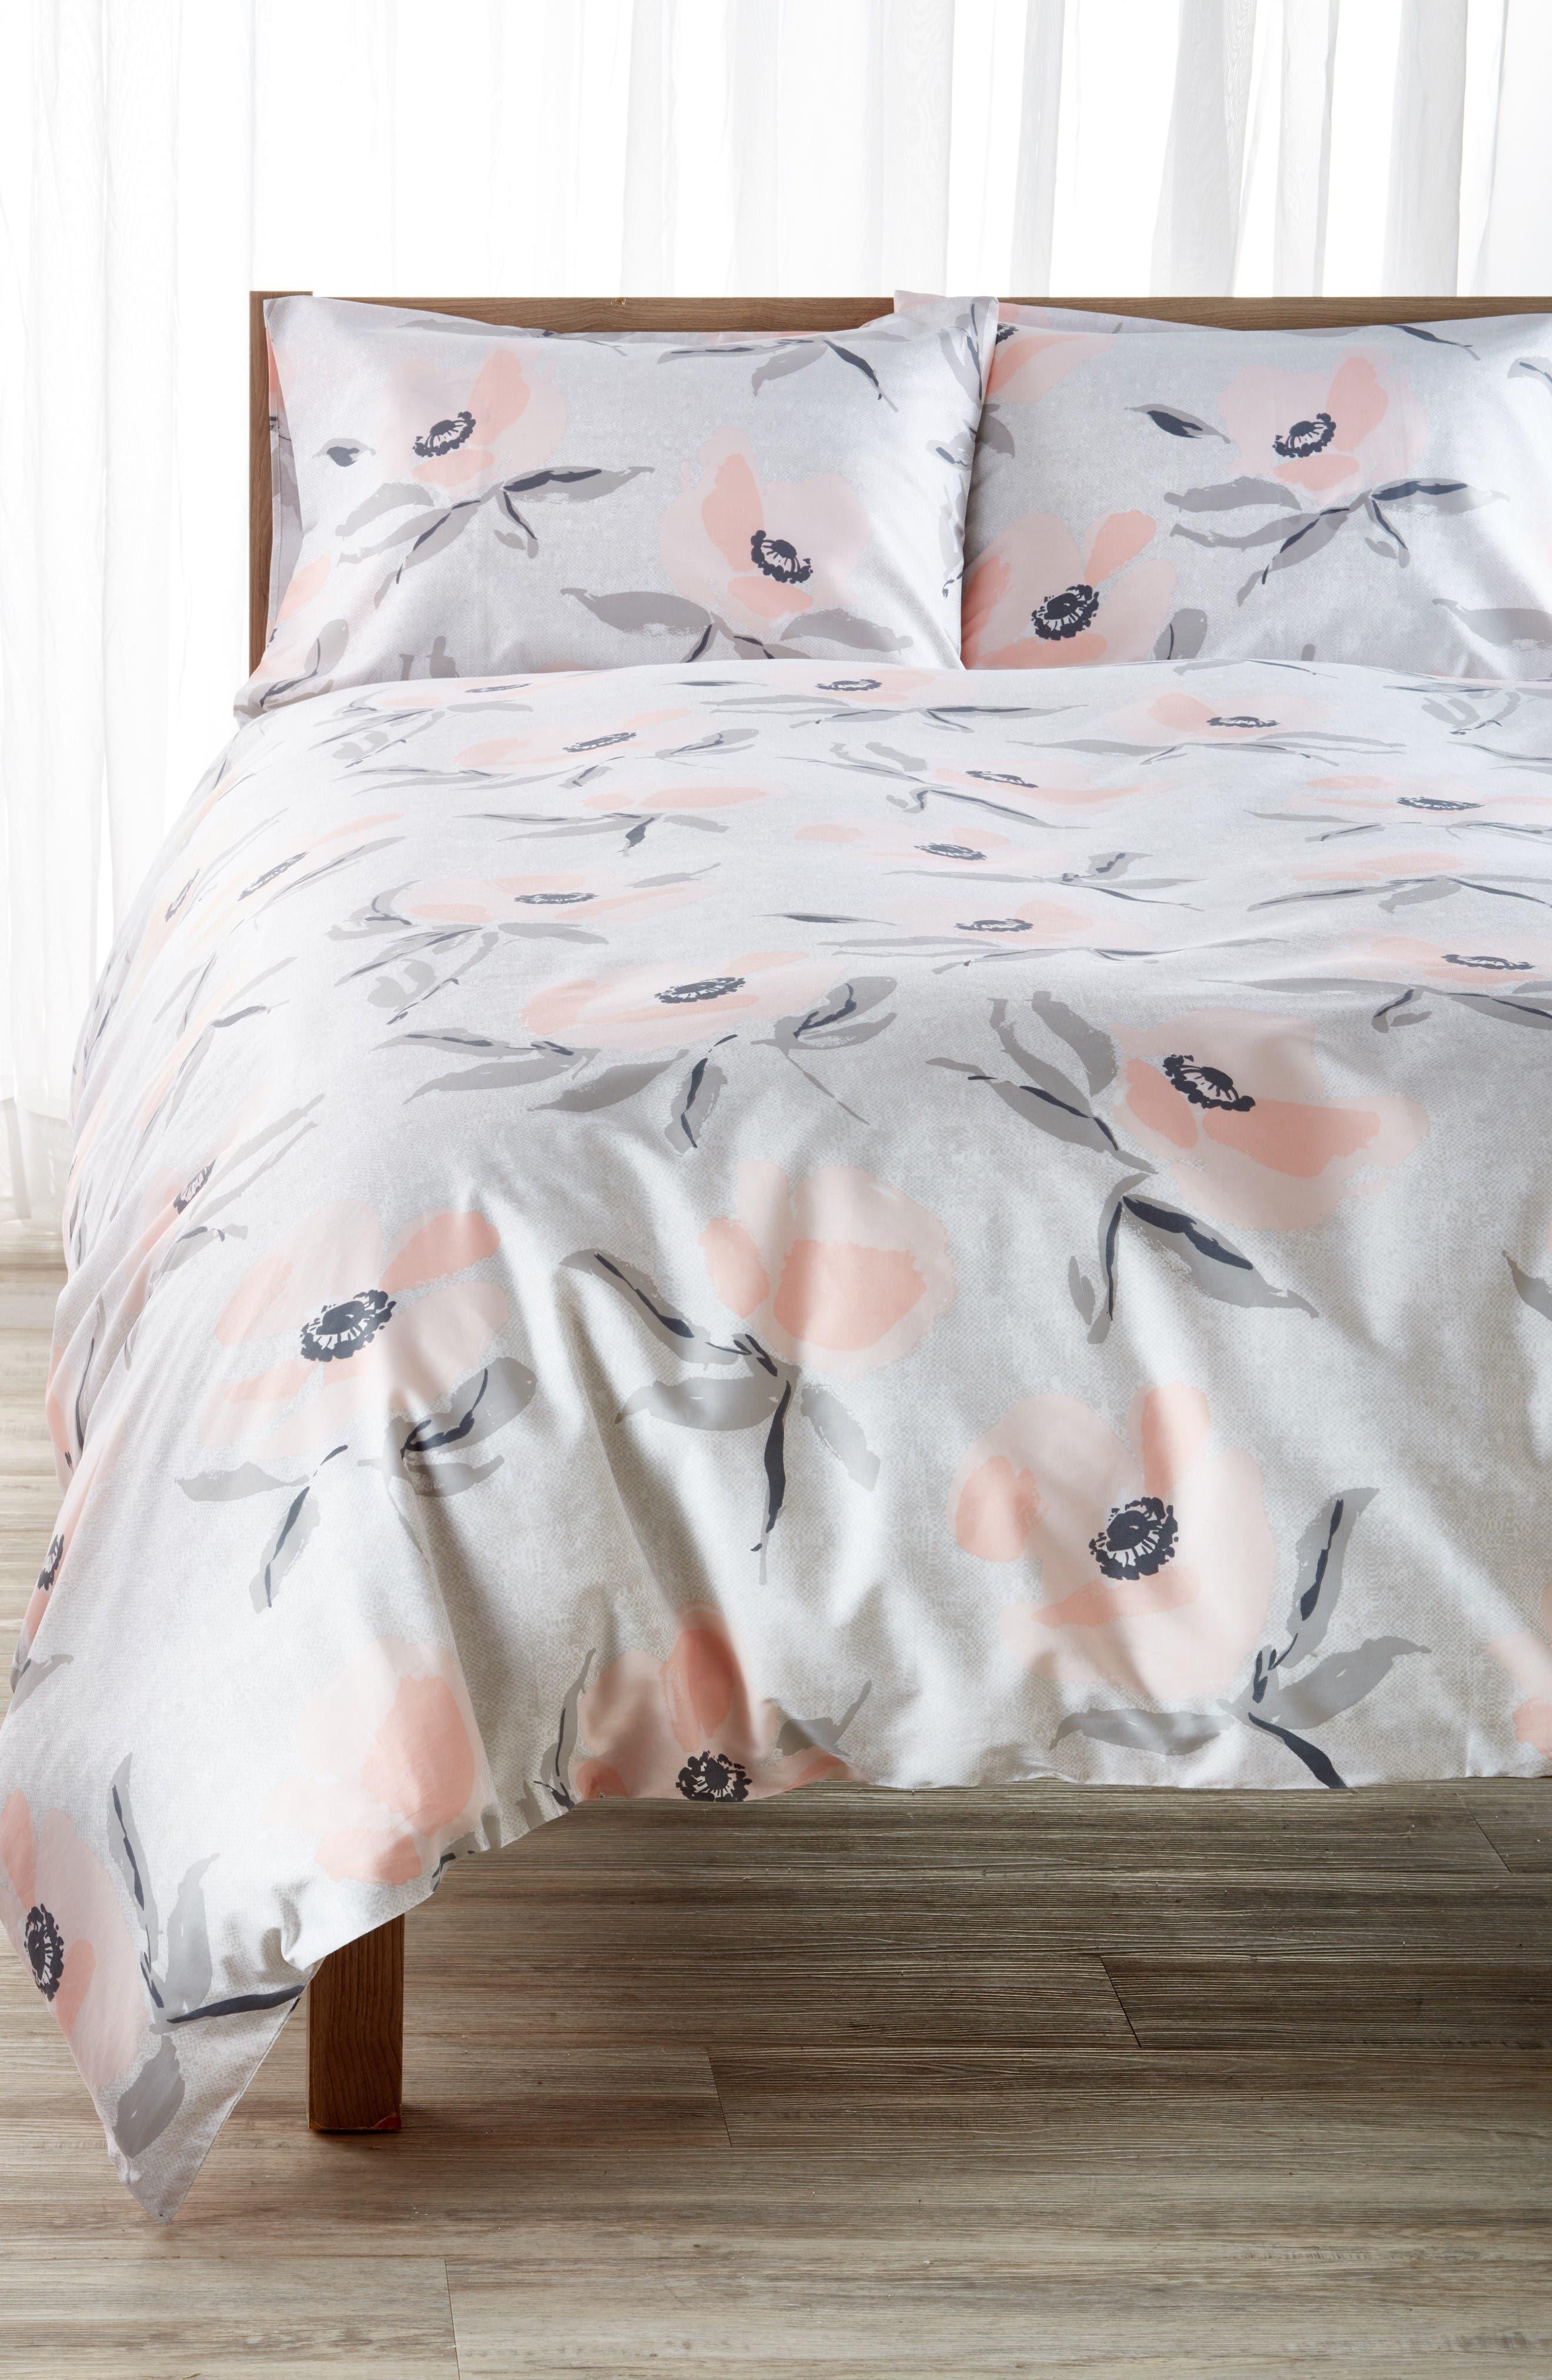 kate spade new york poppies comforter & sham set